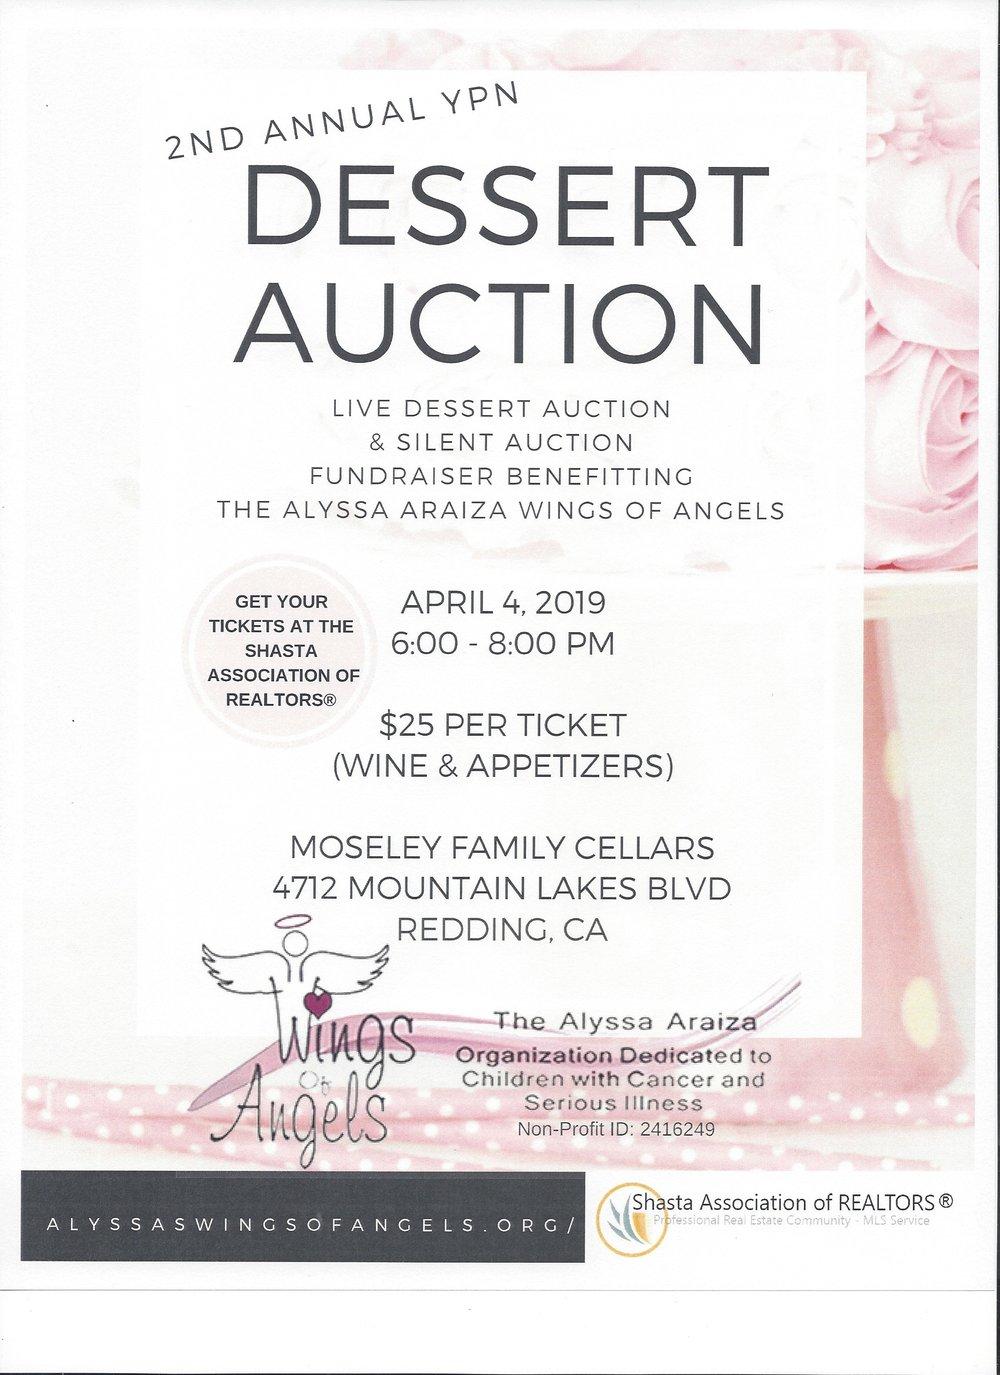 19-03-06;YPN Dessert Auction 2019.jpg